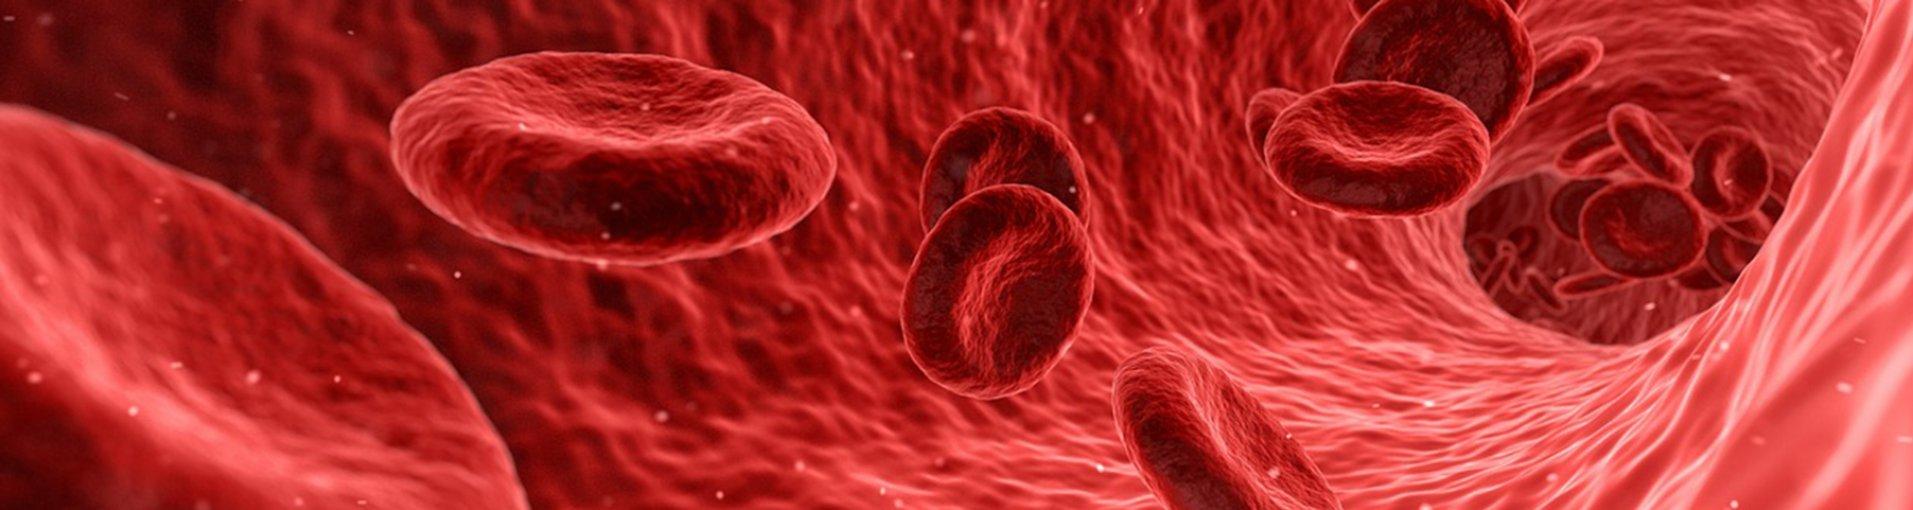 merevedéssel, spermium vérrel